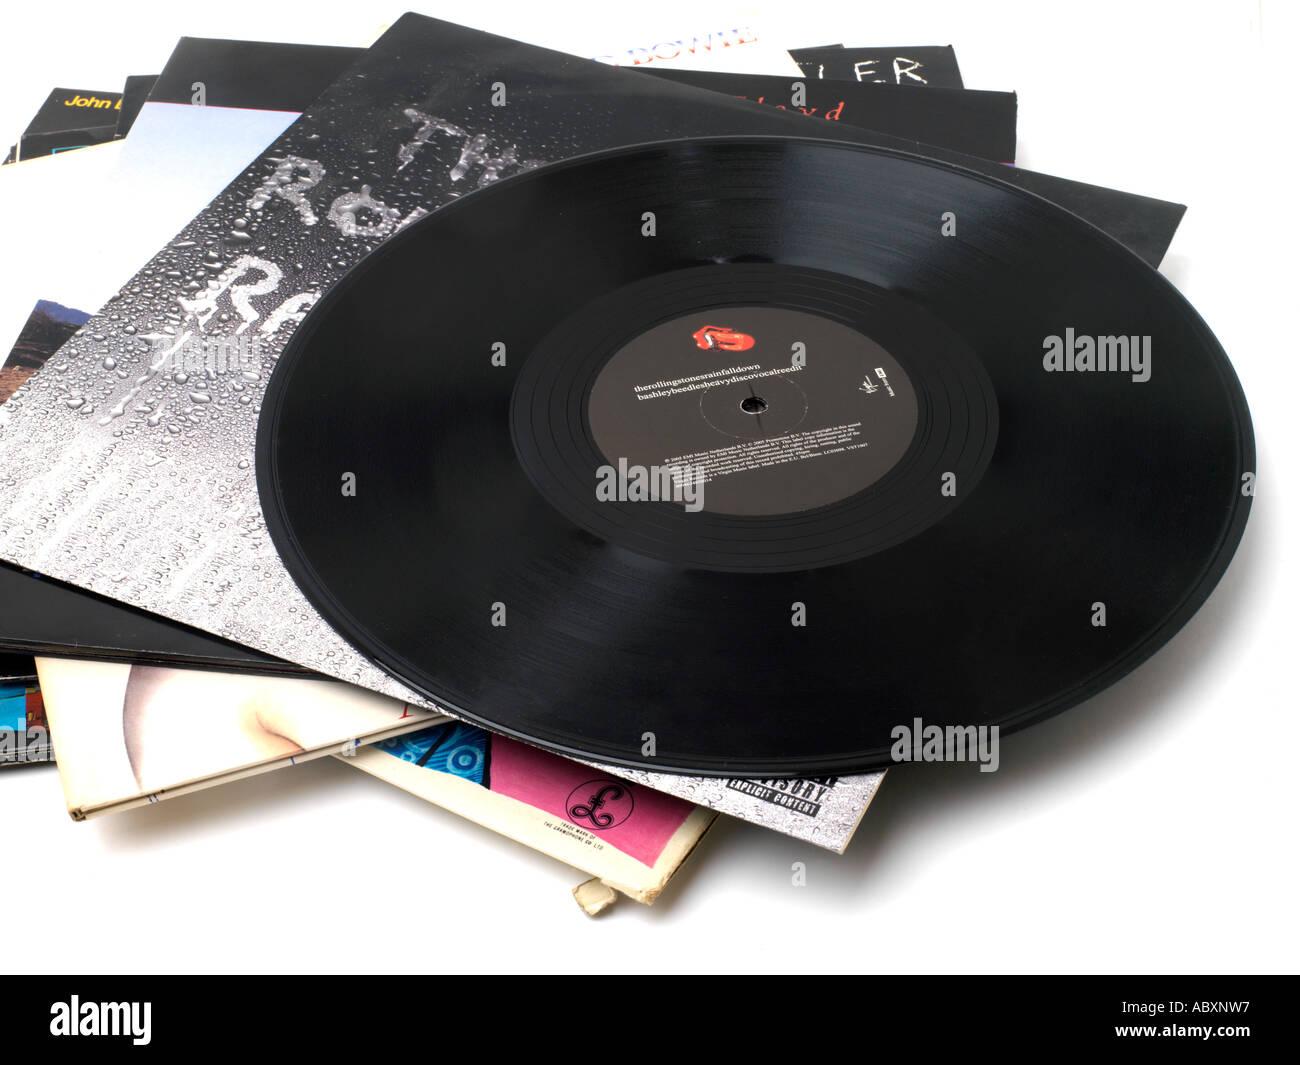 Pile of Vinyl Records - Stock Image